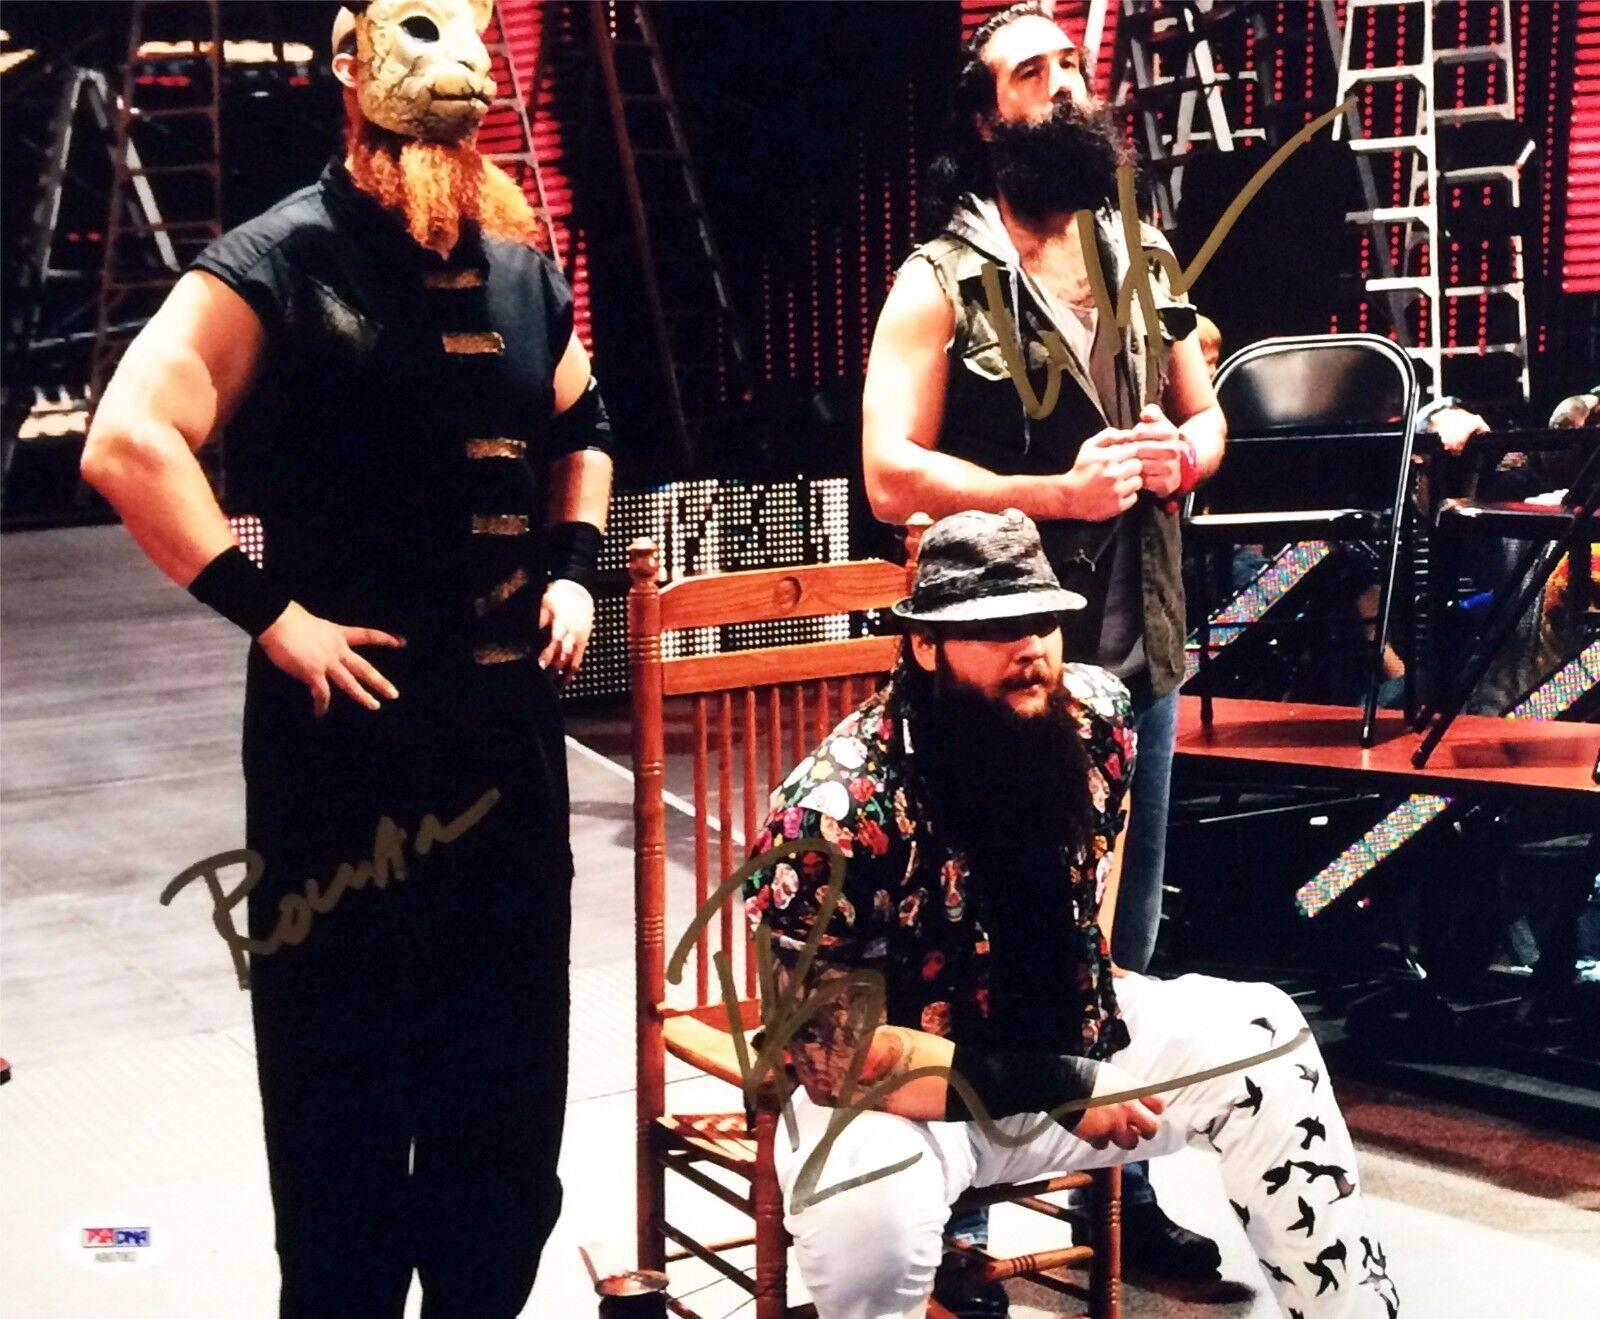 Bray Wyatt Luke Harper Erick Ronan Signed Autographed 11x14 Photo PSA AB07062